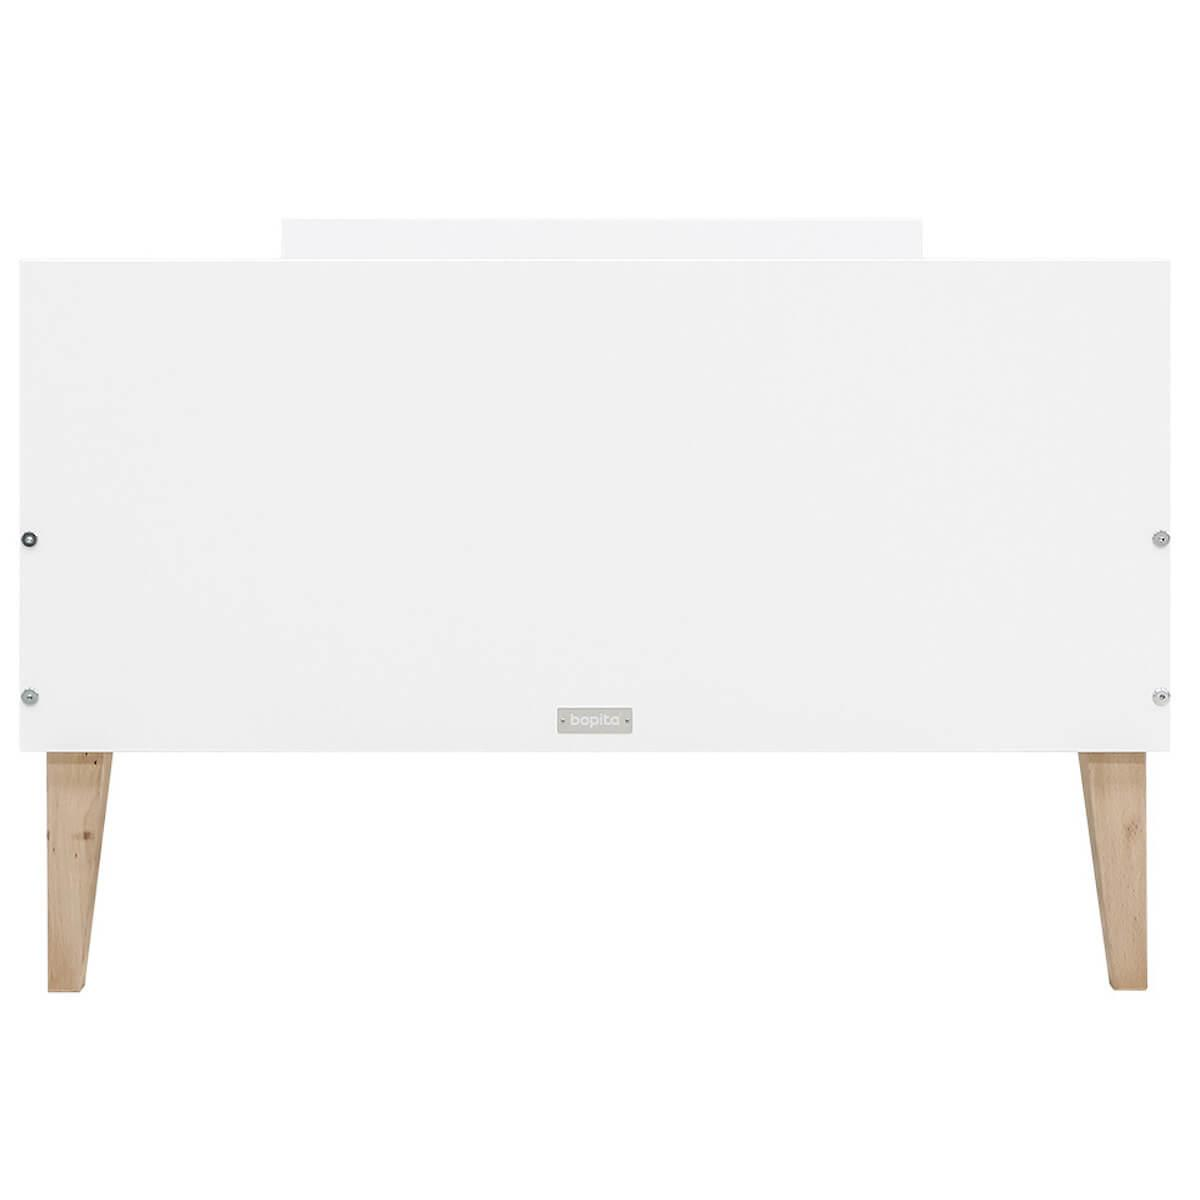 Lit 90x200cm INDY Bopita blanc-naturel